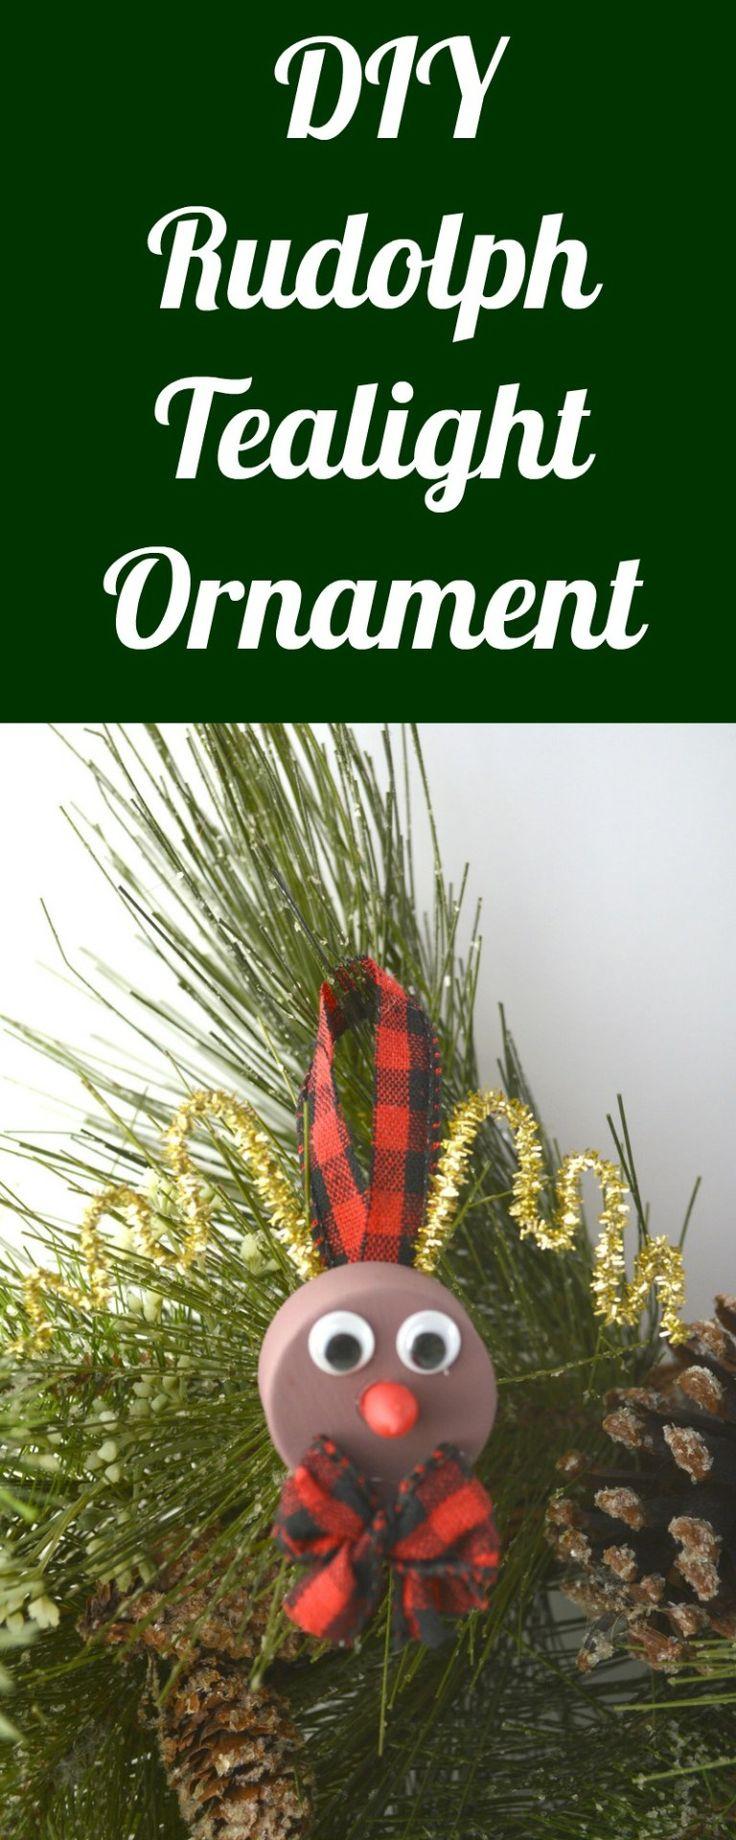 DIY Rudolph Tealight Ornament Fun holiday crafts